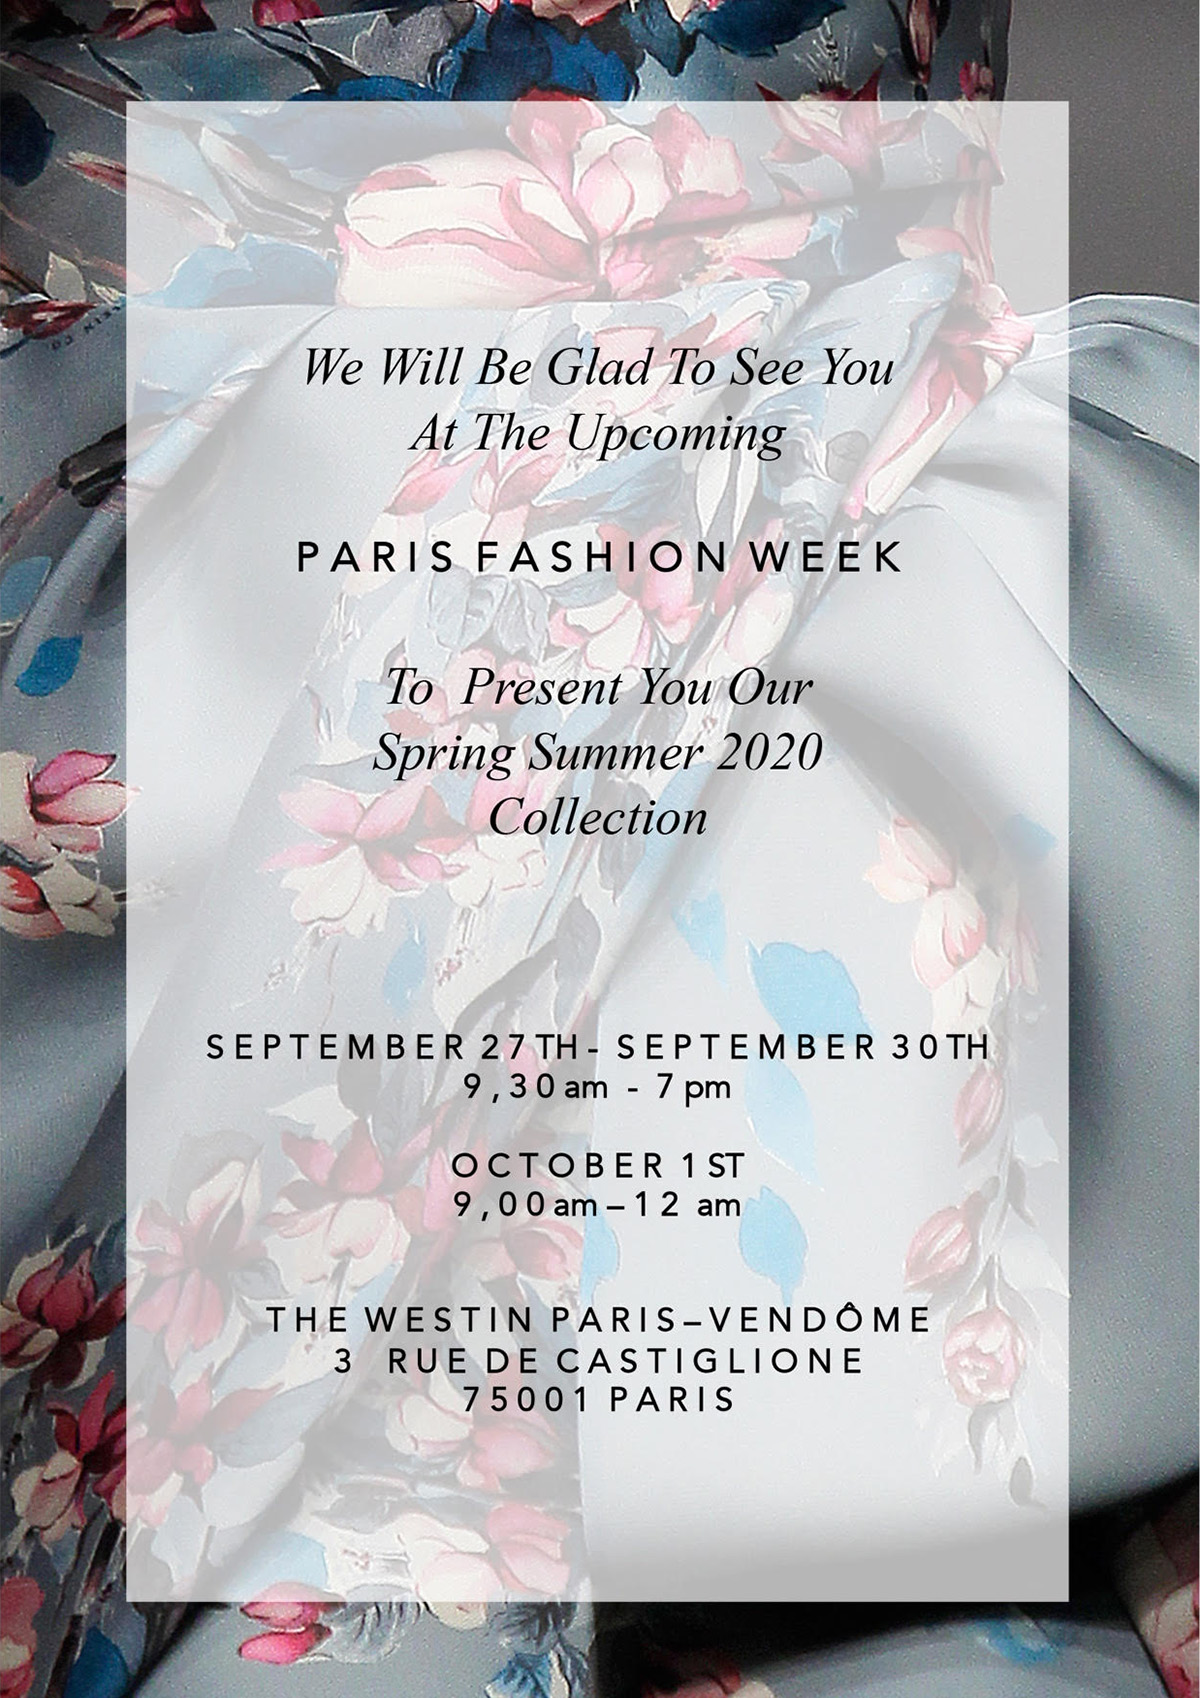 THE 2ND SKIN CO./paris-fashion-week2.jpg